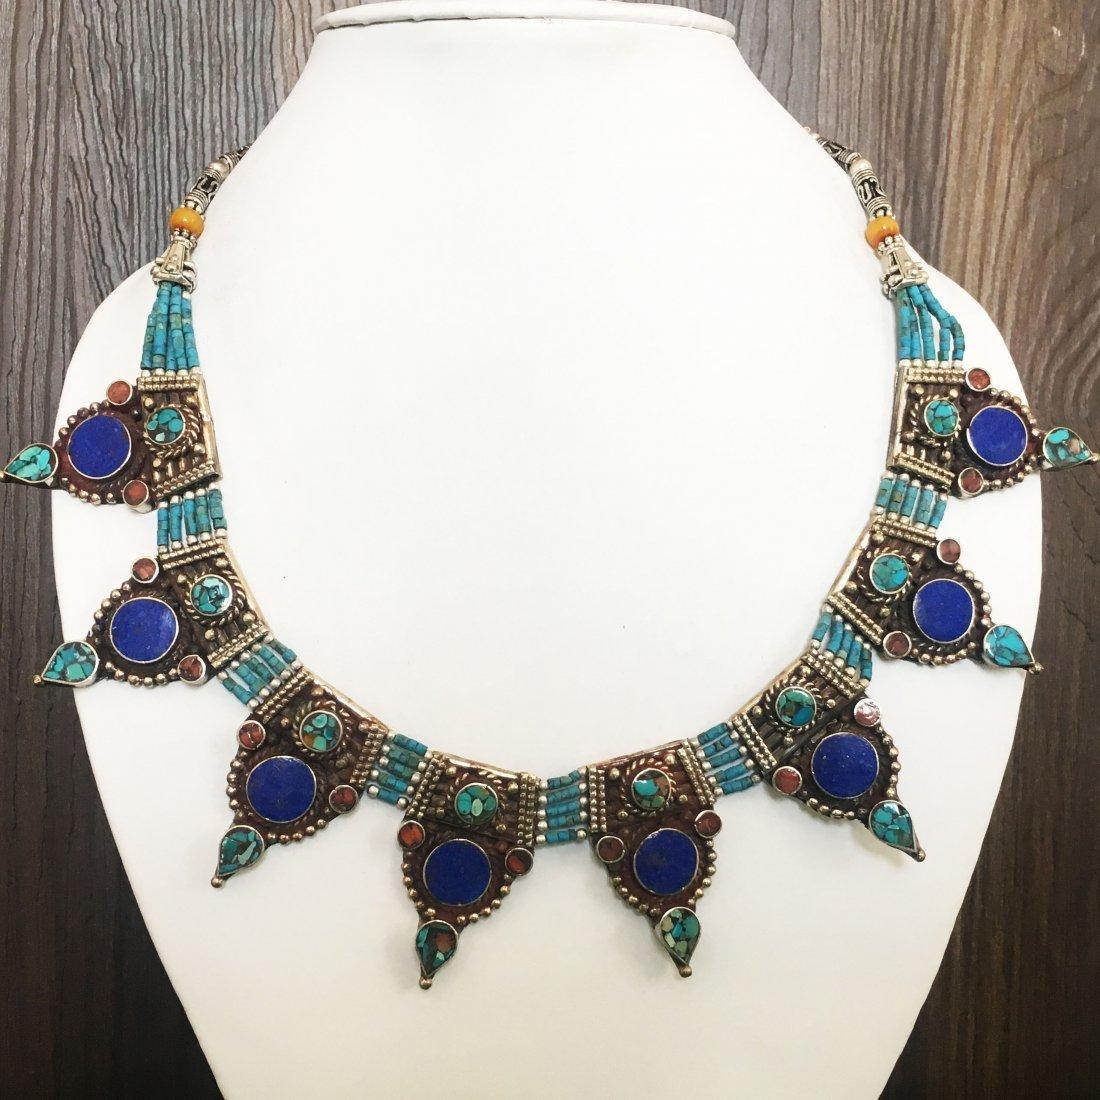 Turquoise & Coral Vintage Tibetan Necklace